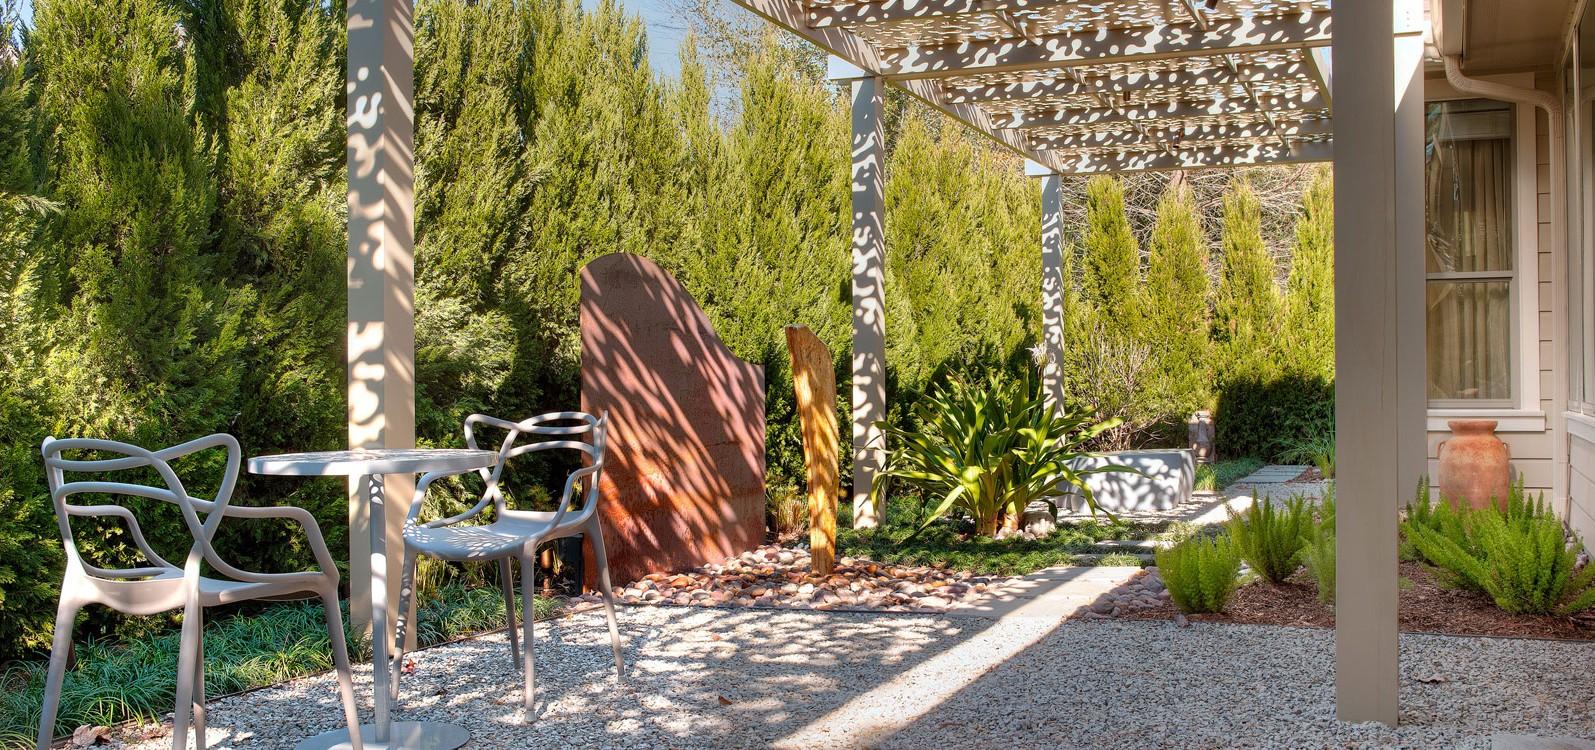 exterior worlds landscaping design